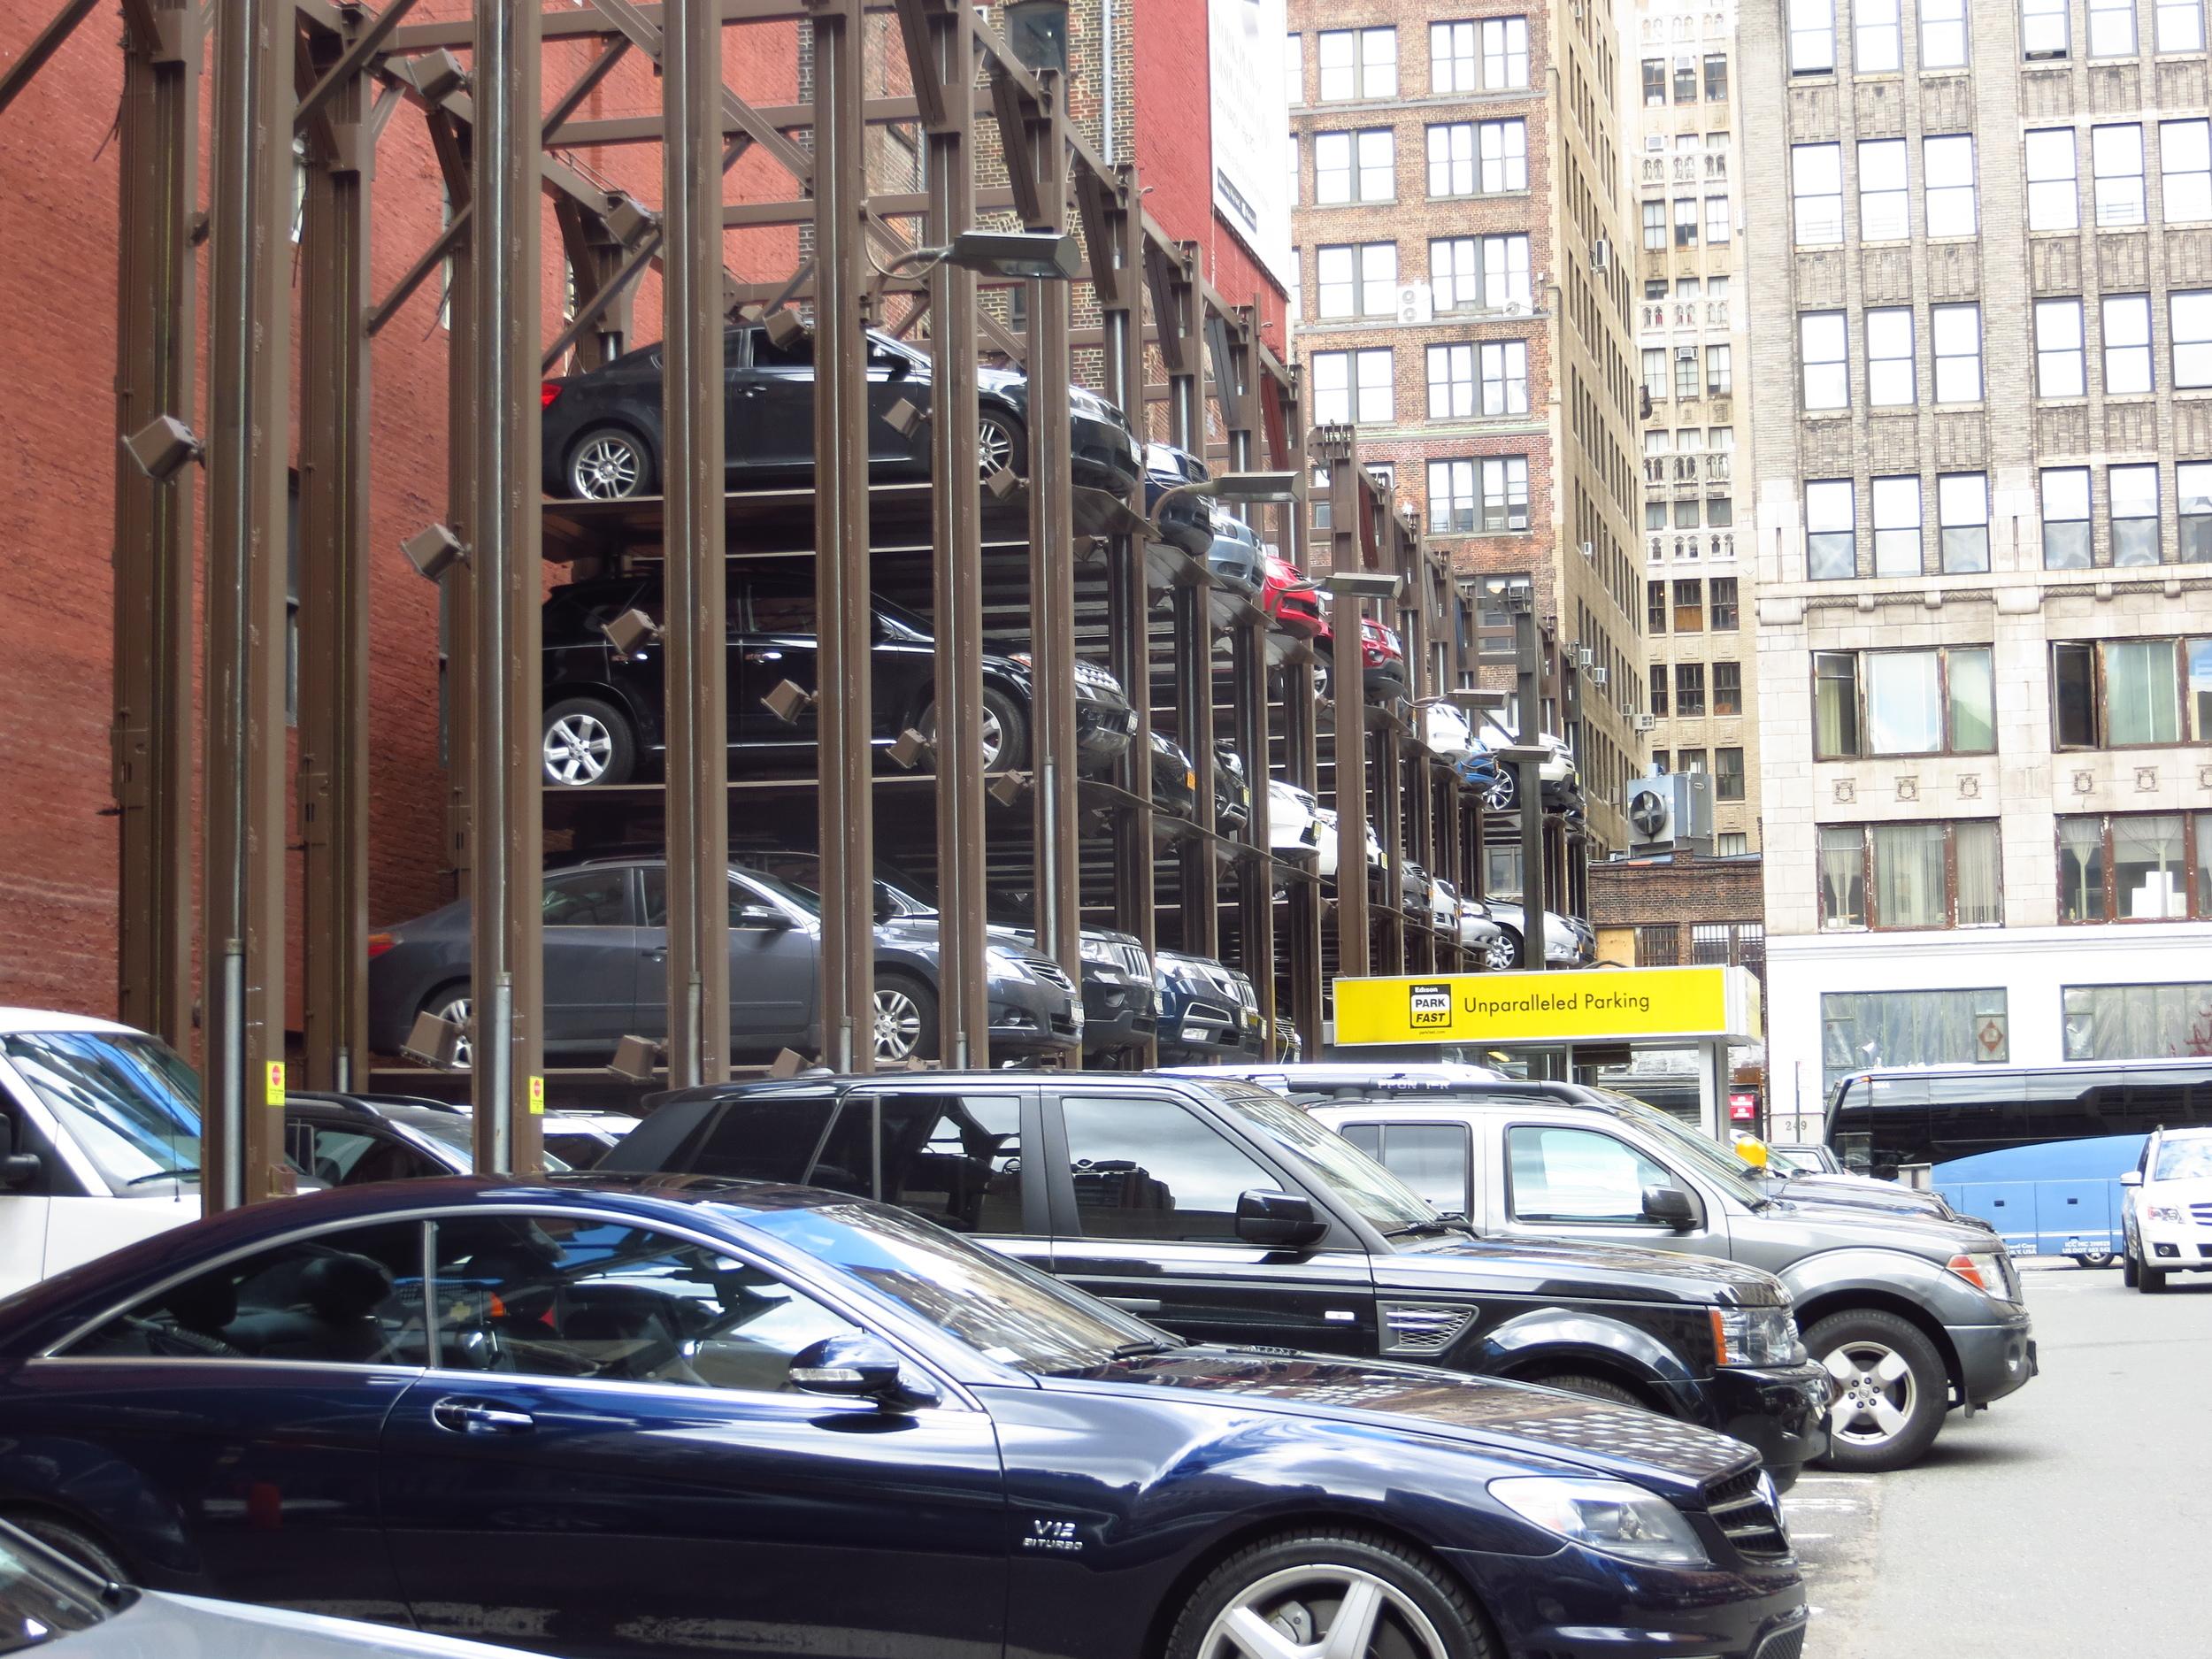 Vertical parking lot